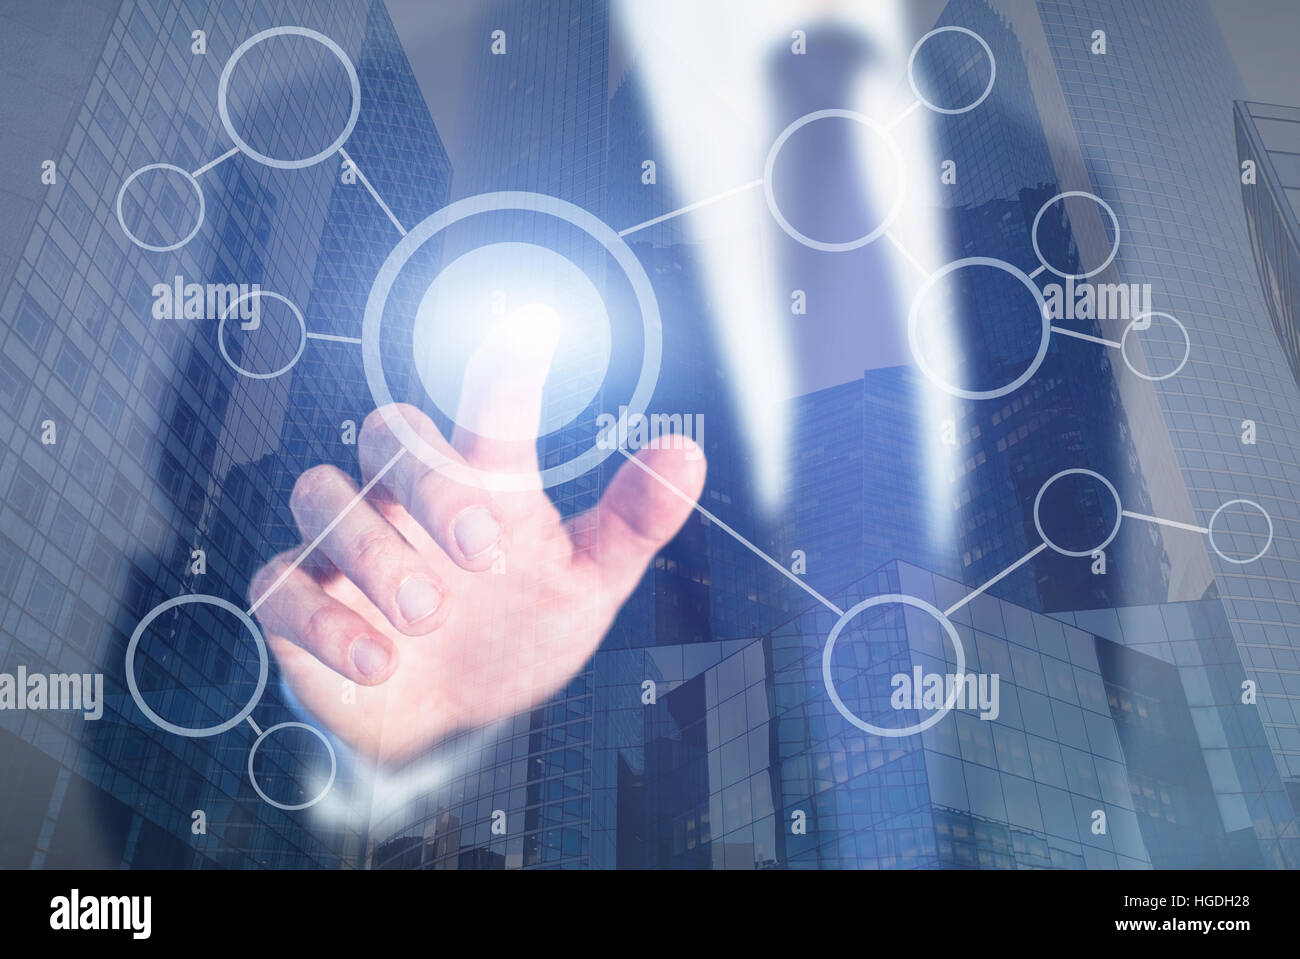 leere Flussdiagramm auf abstrakten Touch-Screen, Prozess oder Ziel Geschäftskonzept Stockbild